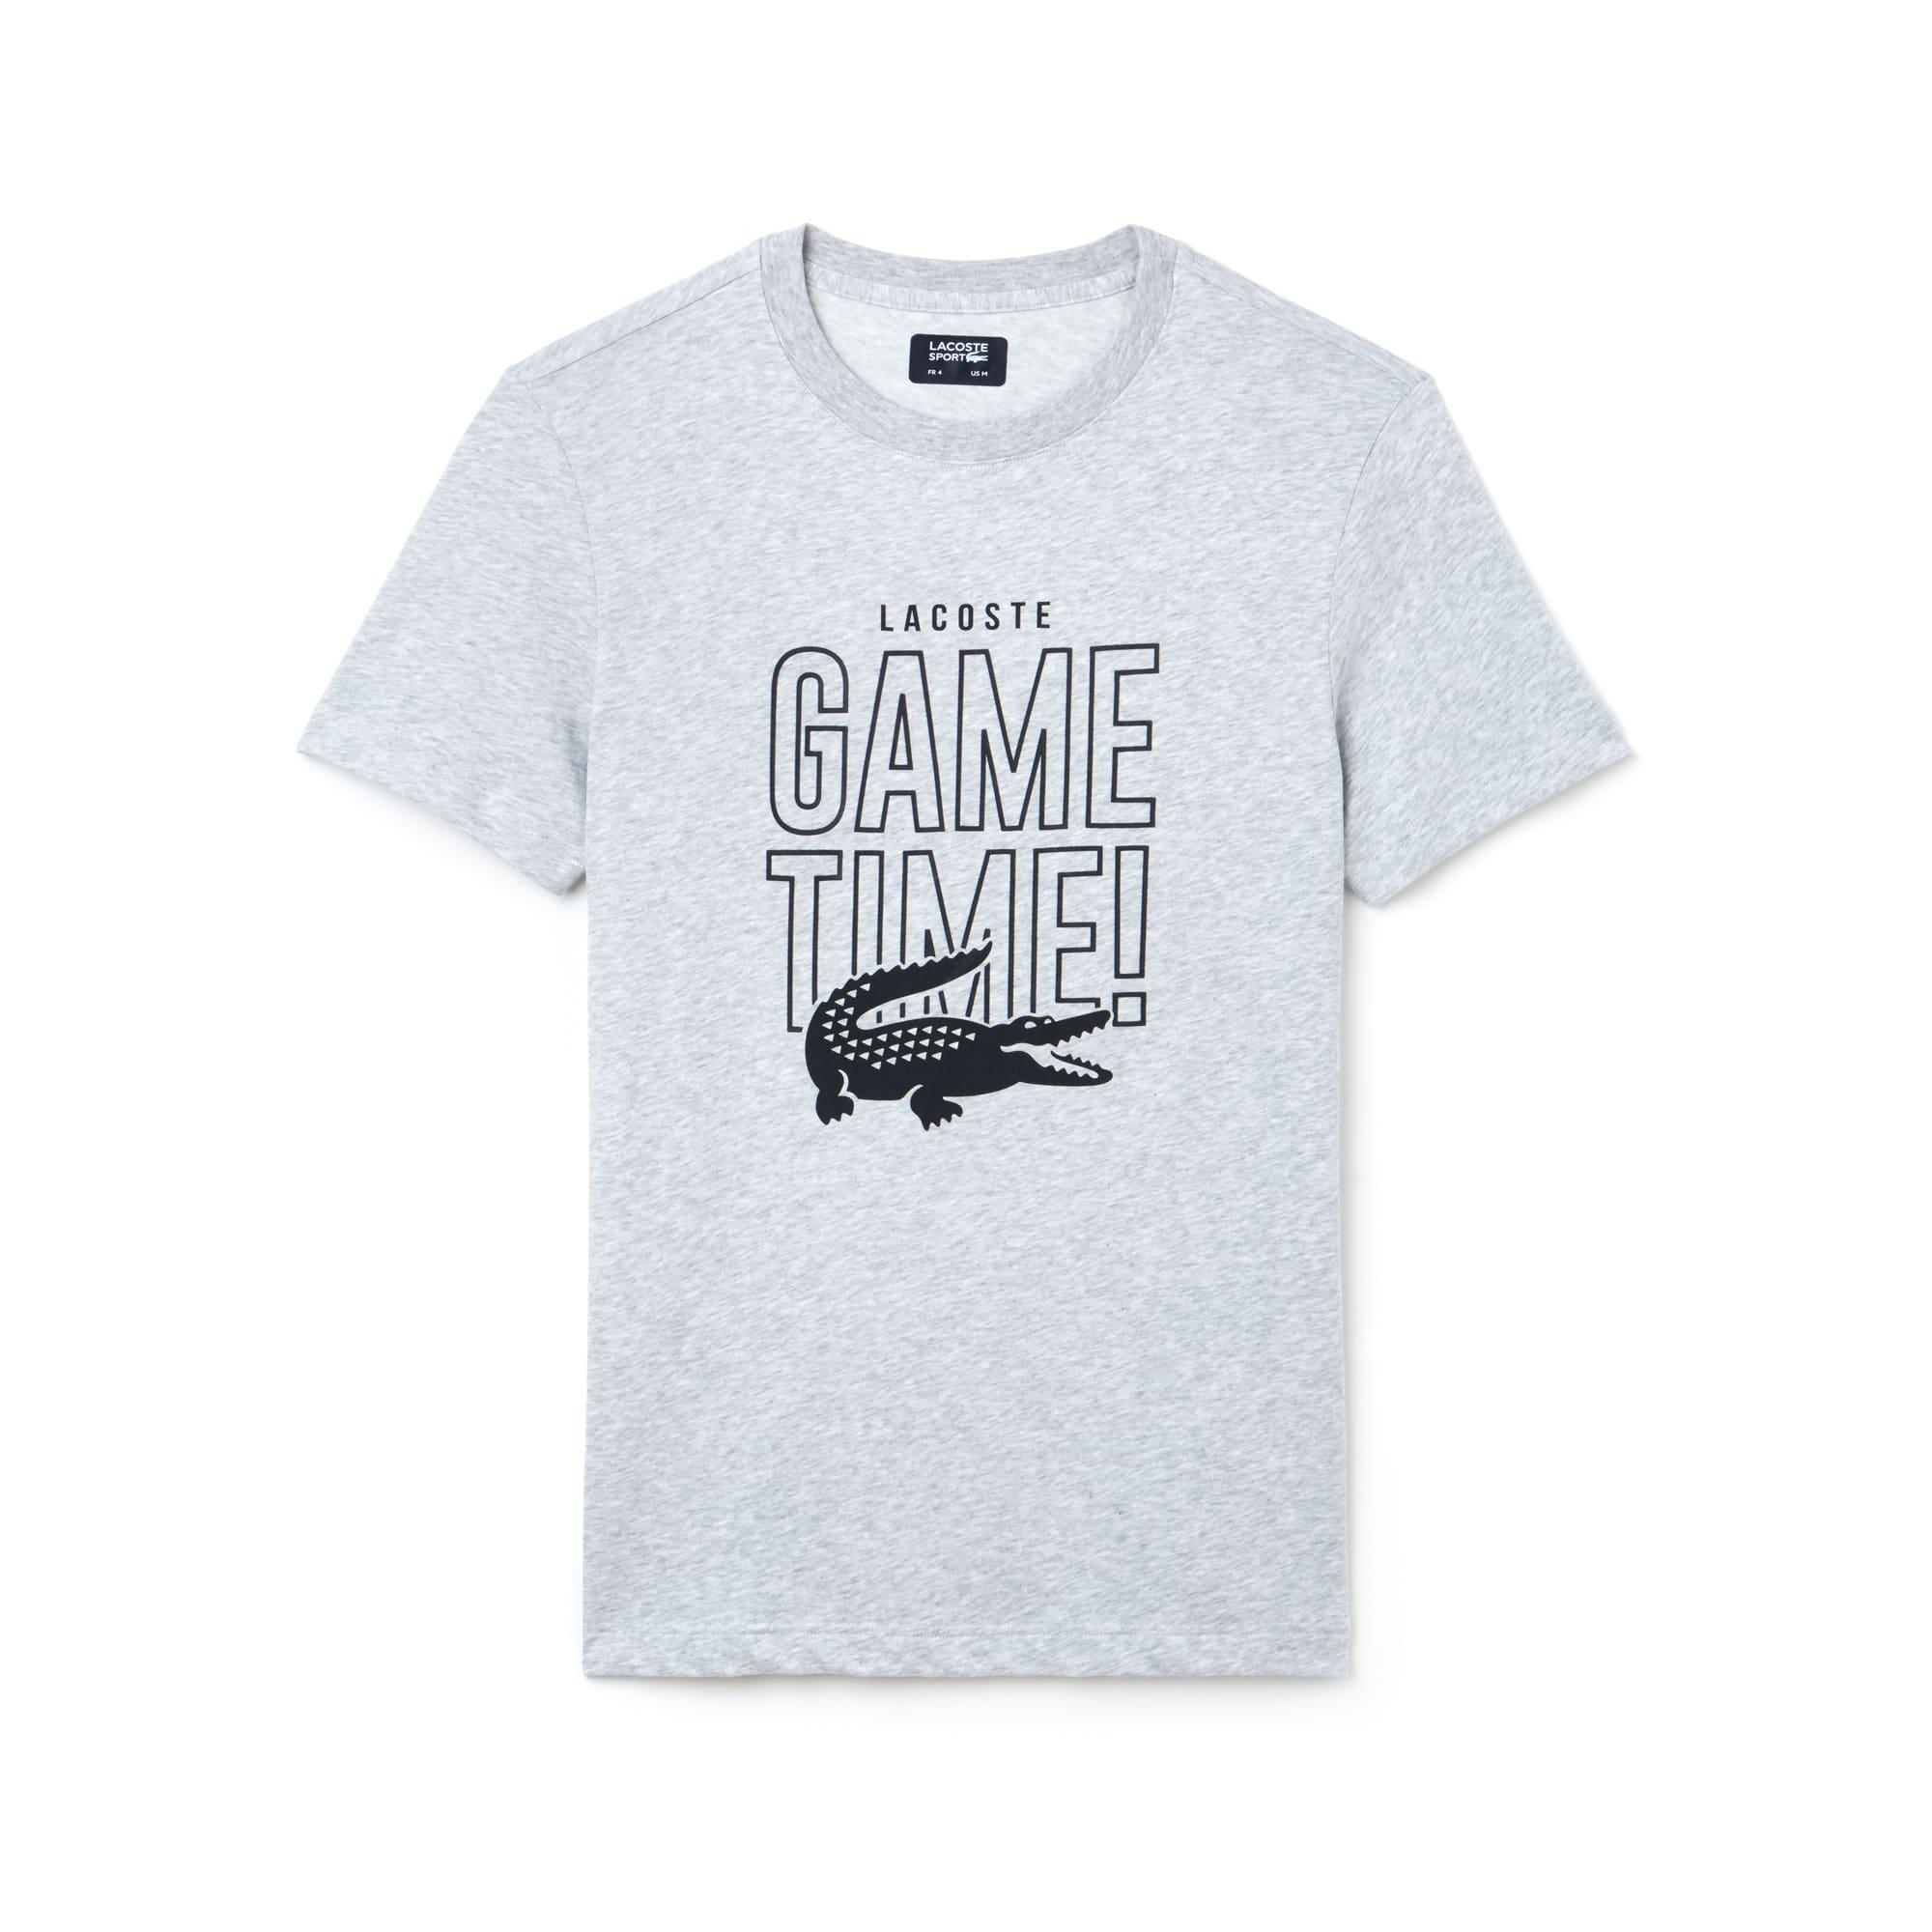 Men's Lacoste SPORT Game Time Crew Neck Jersey Tennis T-shirt